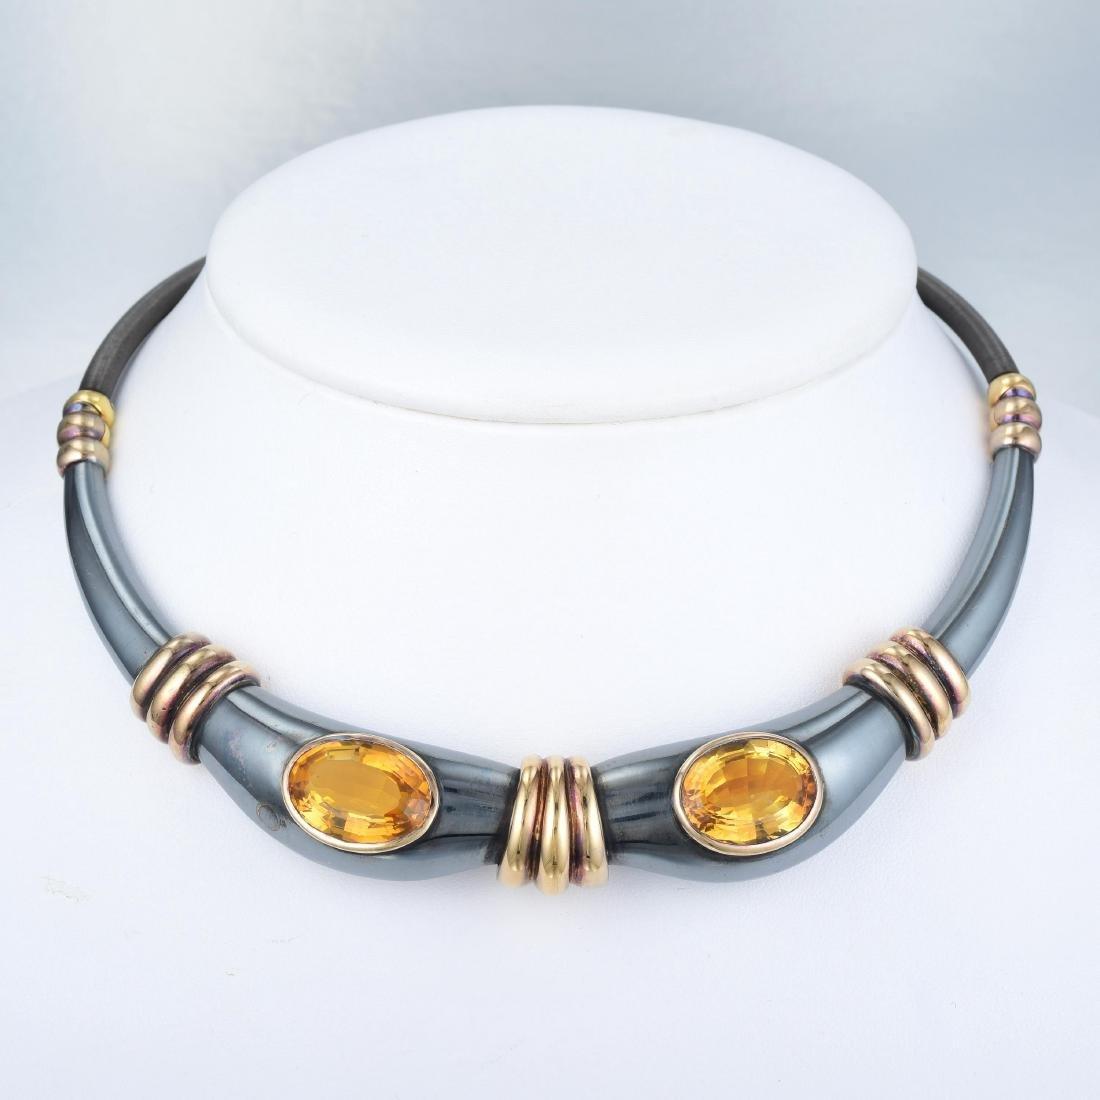 Rene Boivin Citrine Choker Necklace - 4